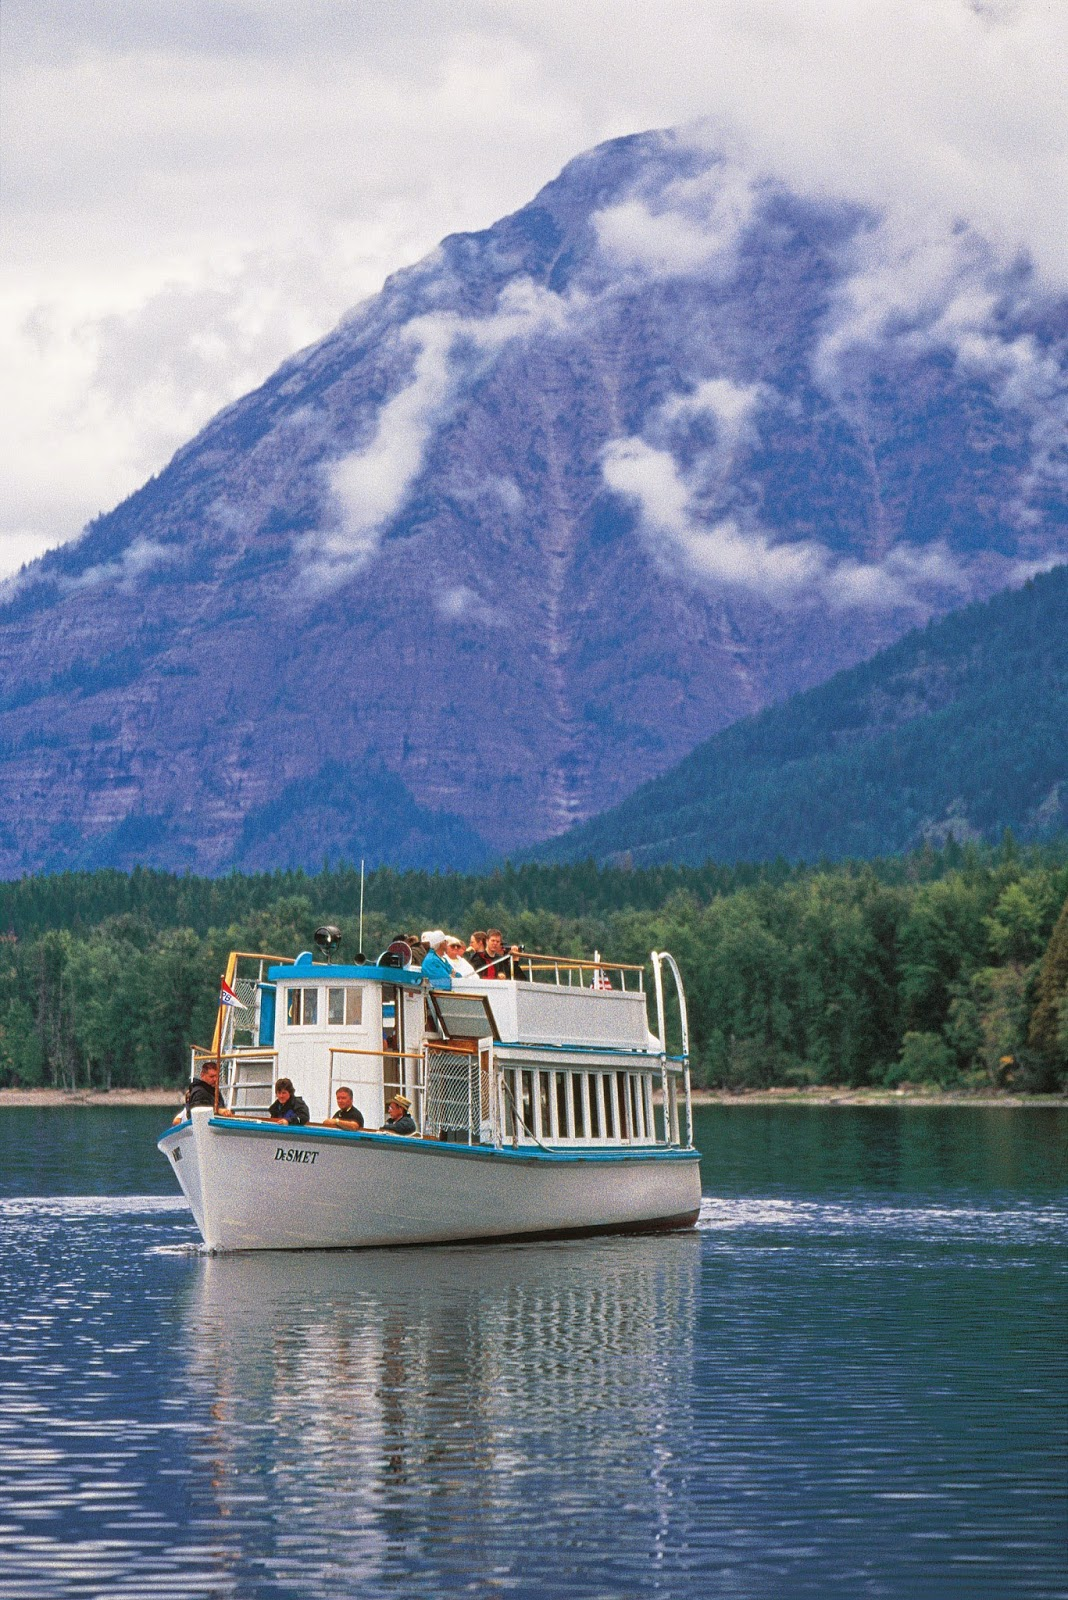 Glacier Park, Inc.: Boat Tours In Glacier National Park